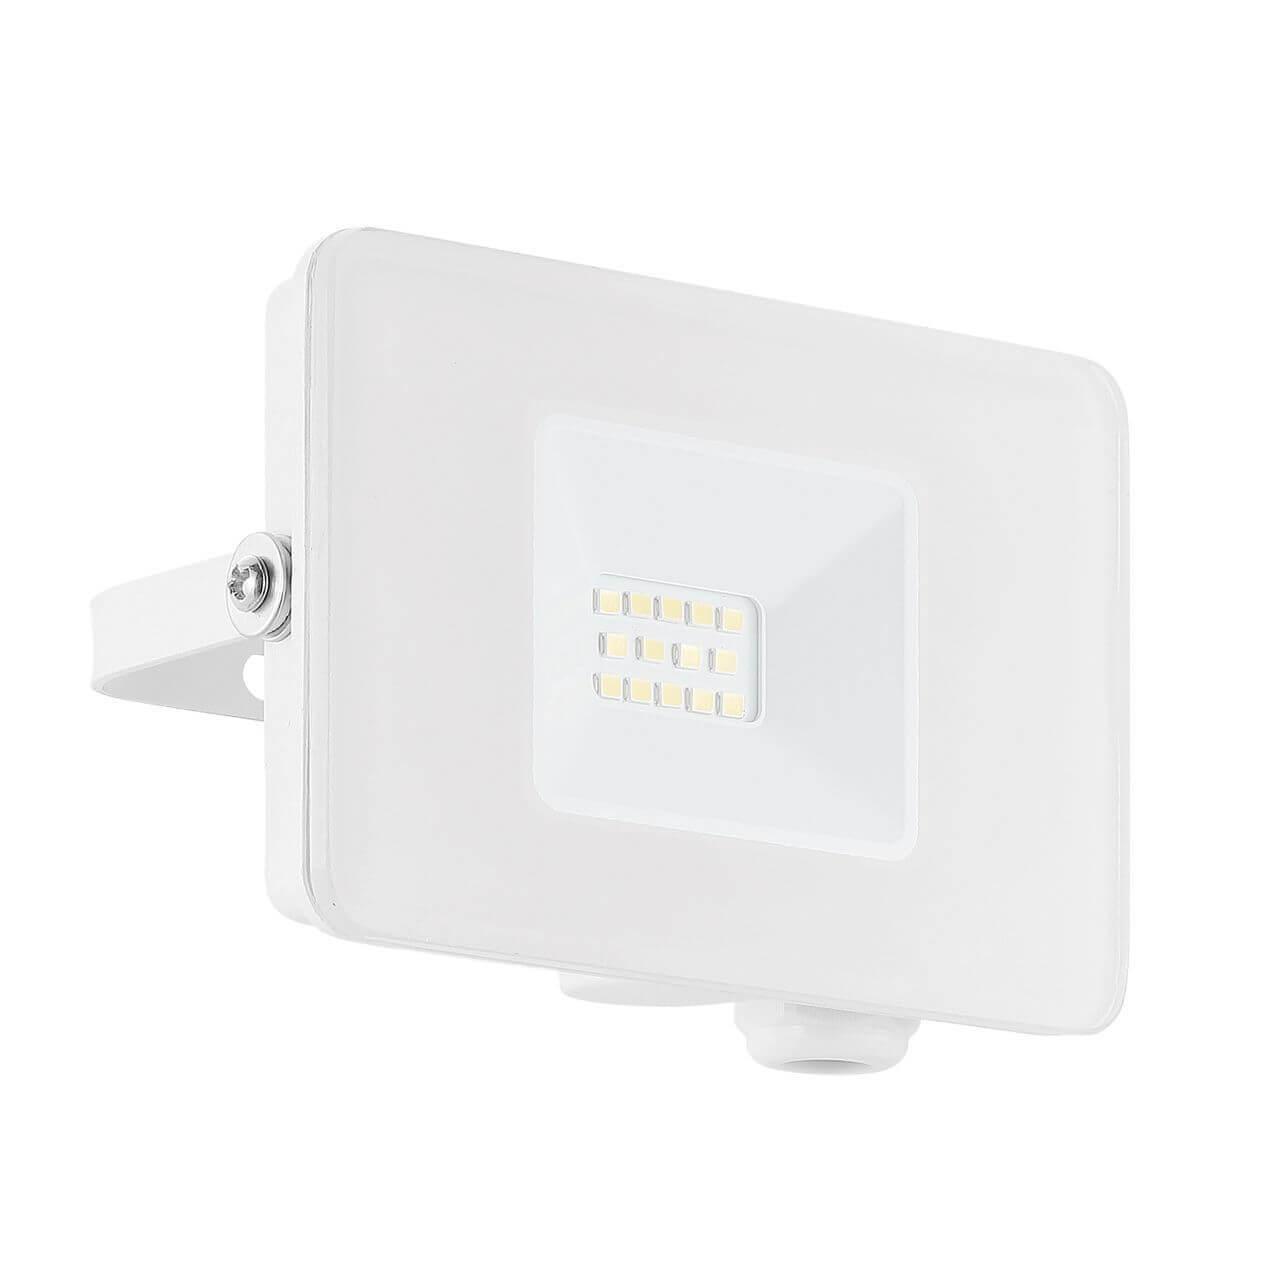 Прожектор Eglo 33152, белый stuhrling 454 33152 page 6